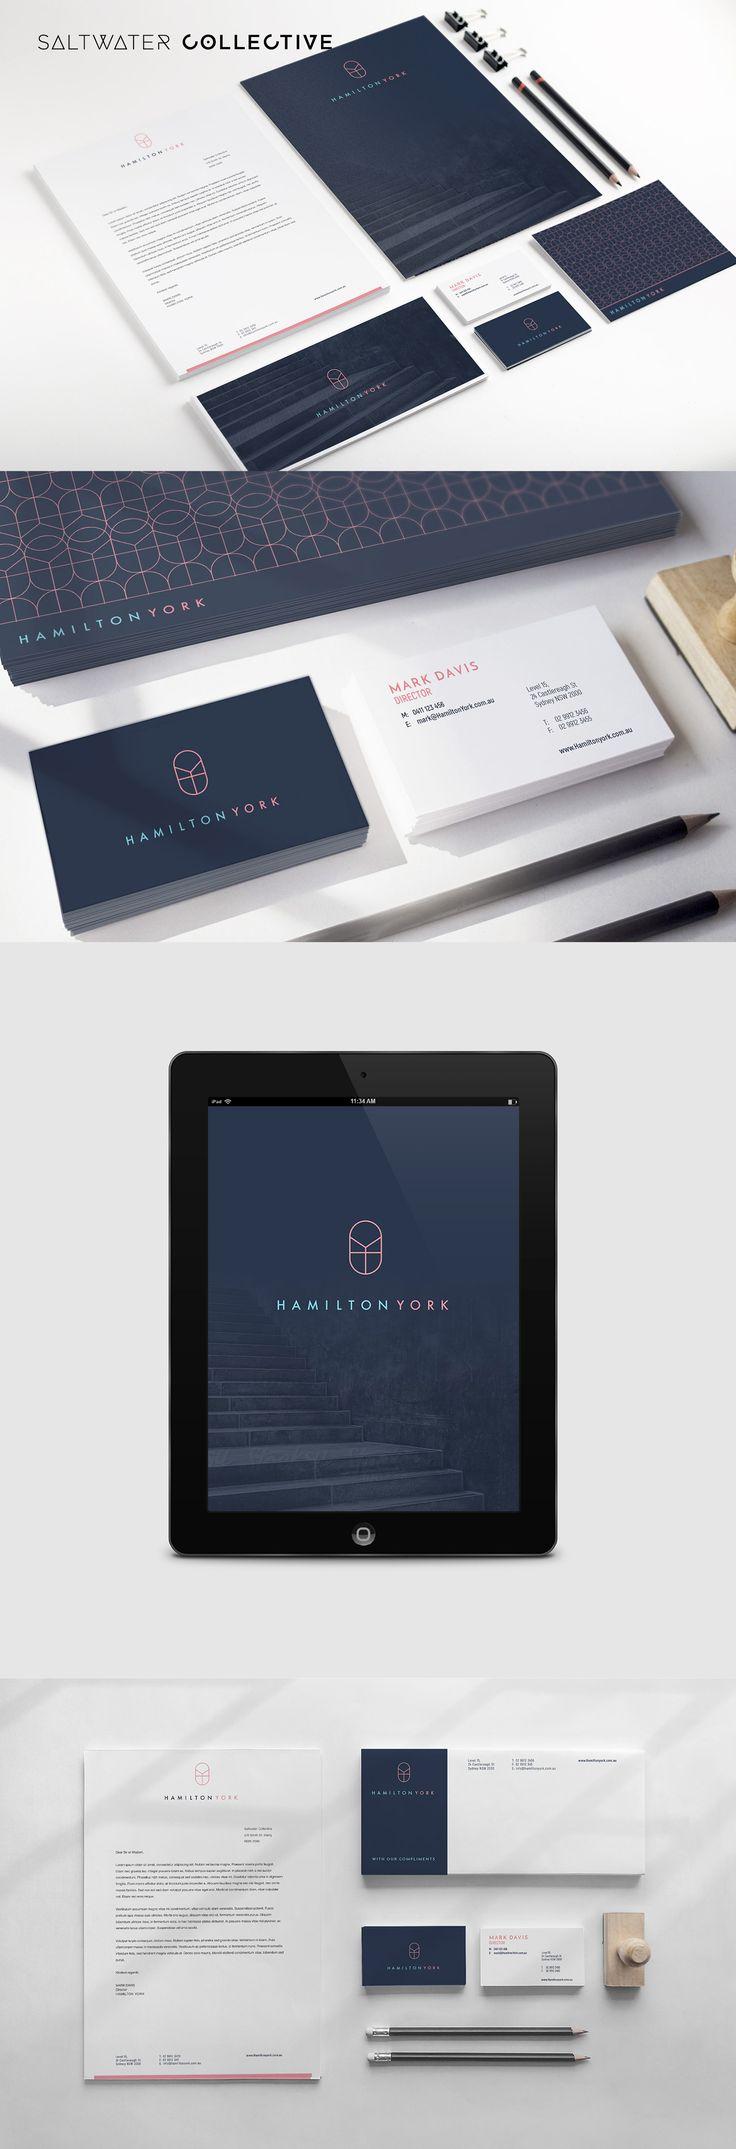 New brand creation for Hamilton York #DesignedBySWC